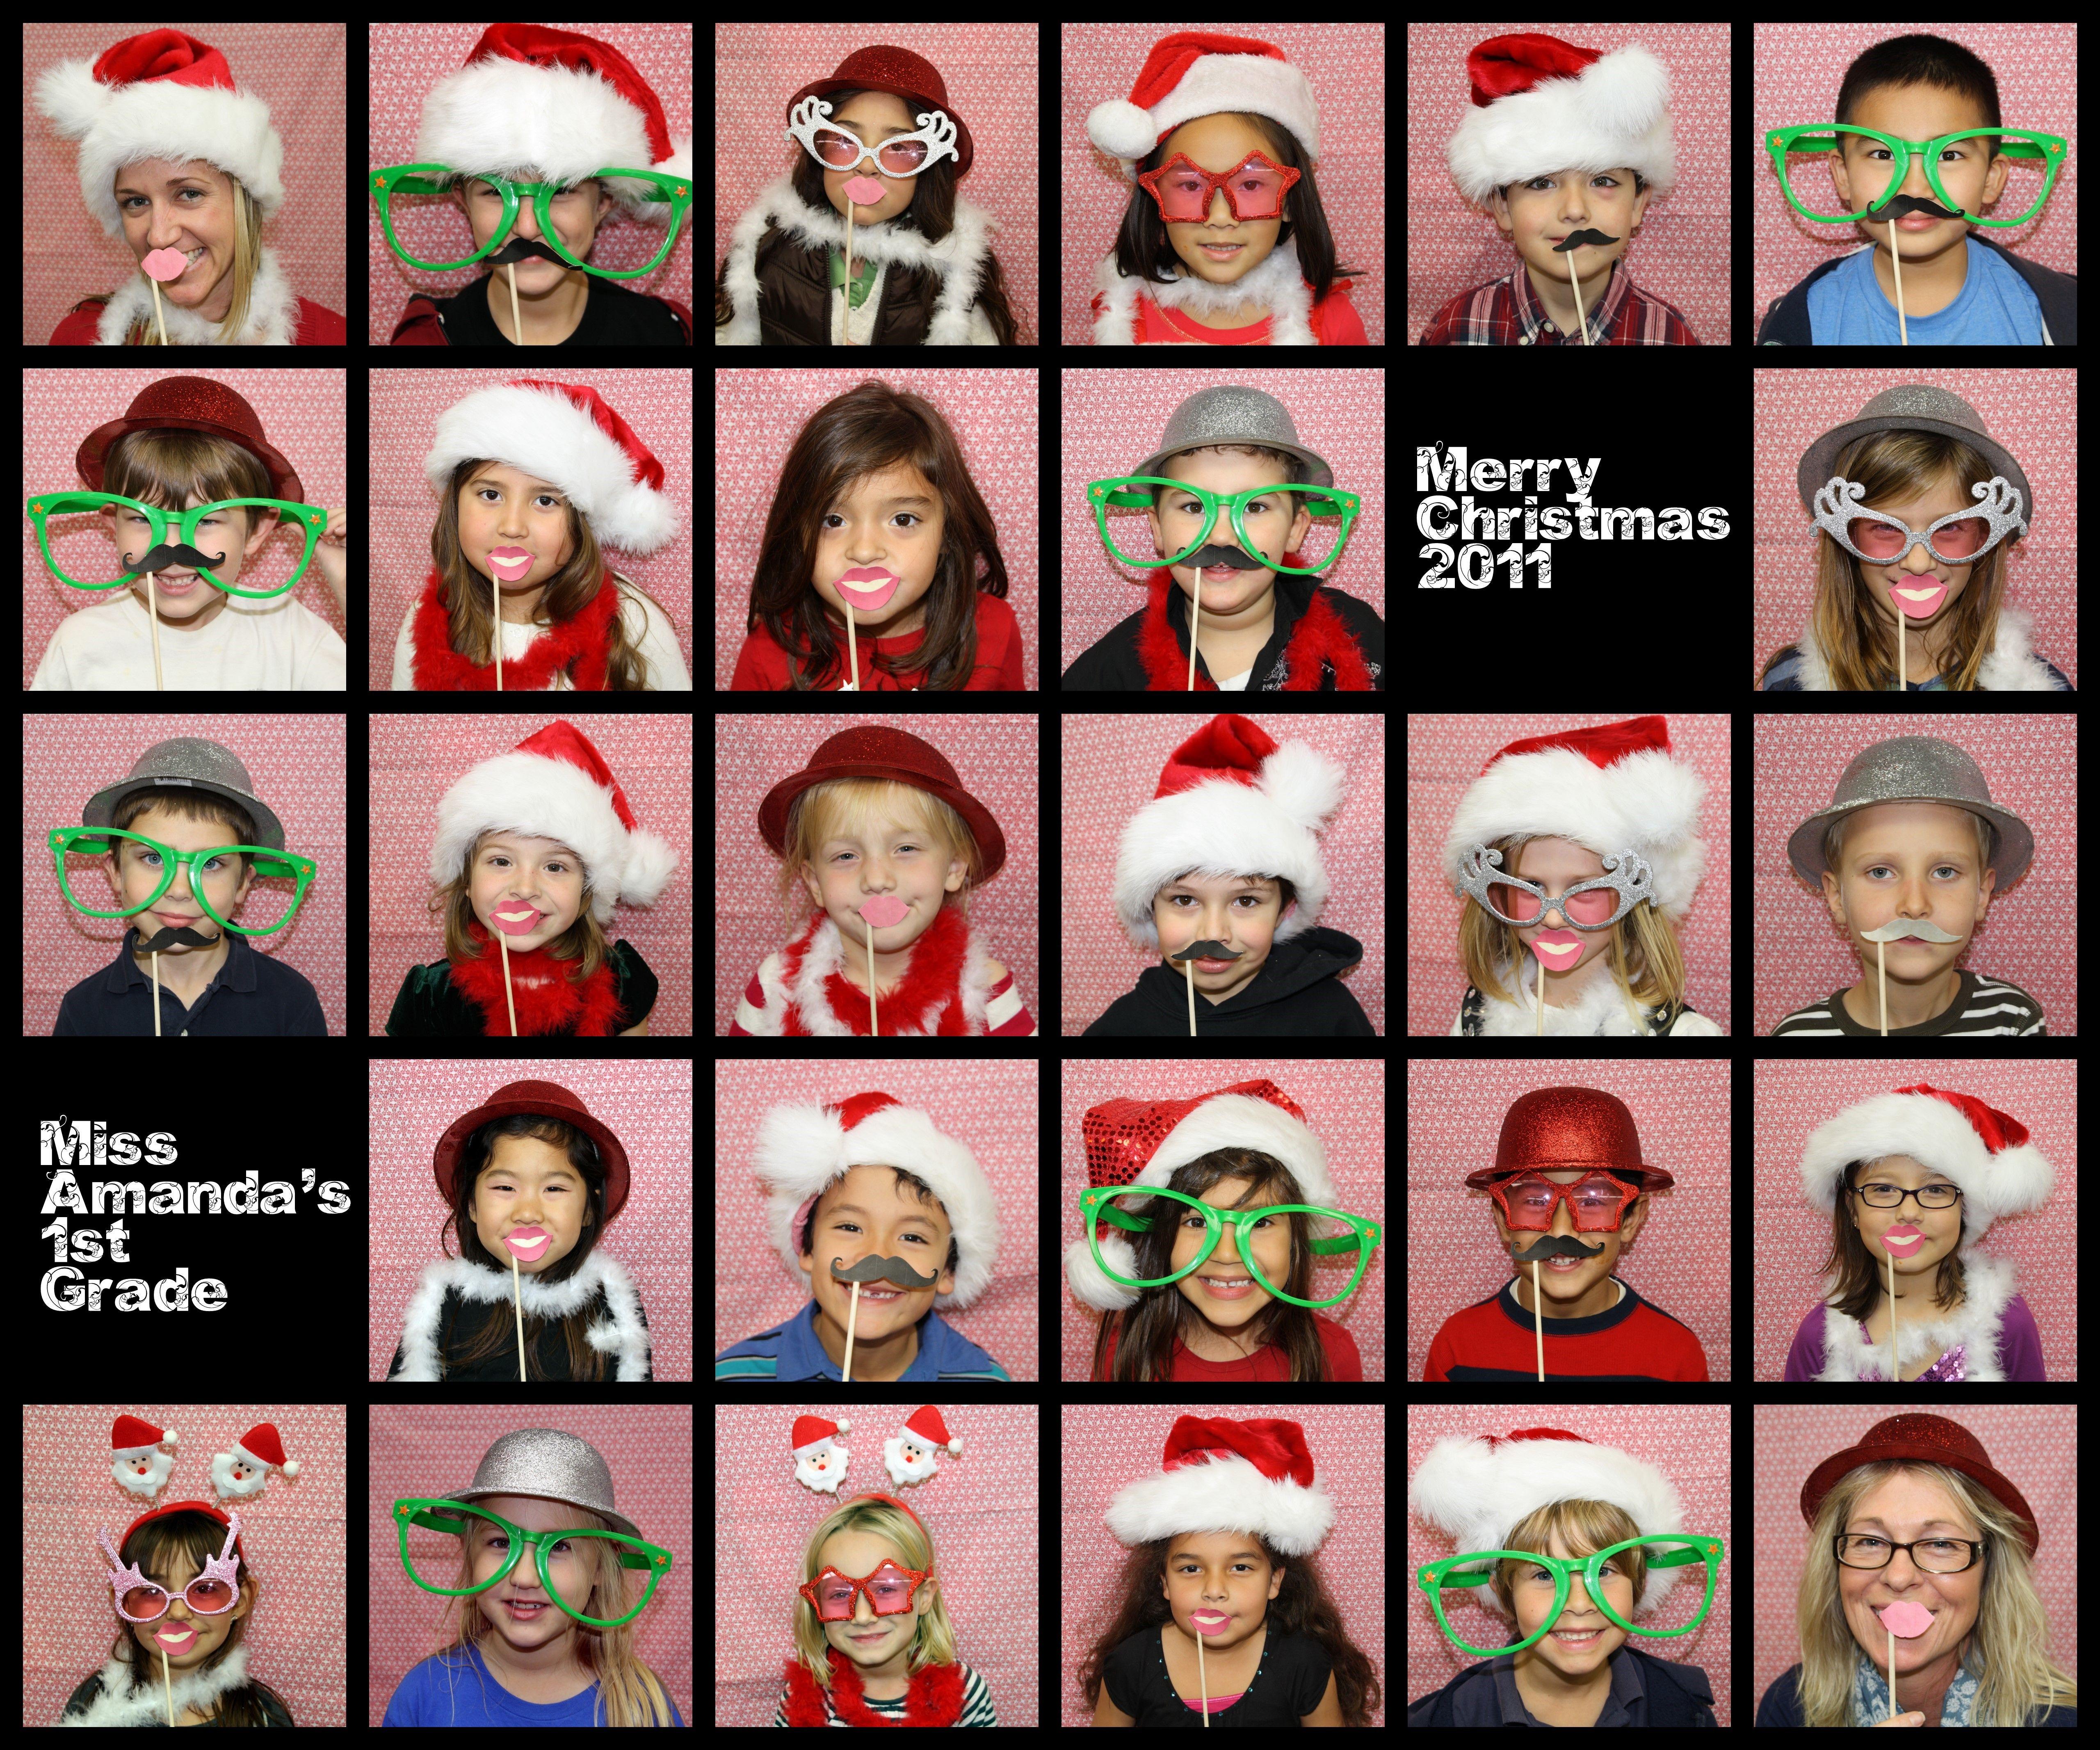 2Nd Grade Christmas Party Ideas  1st grade class christmas party photo booth photobooth